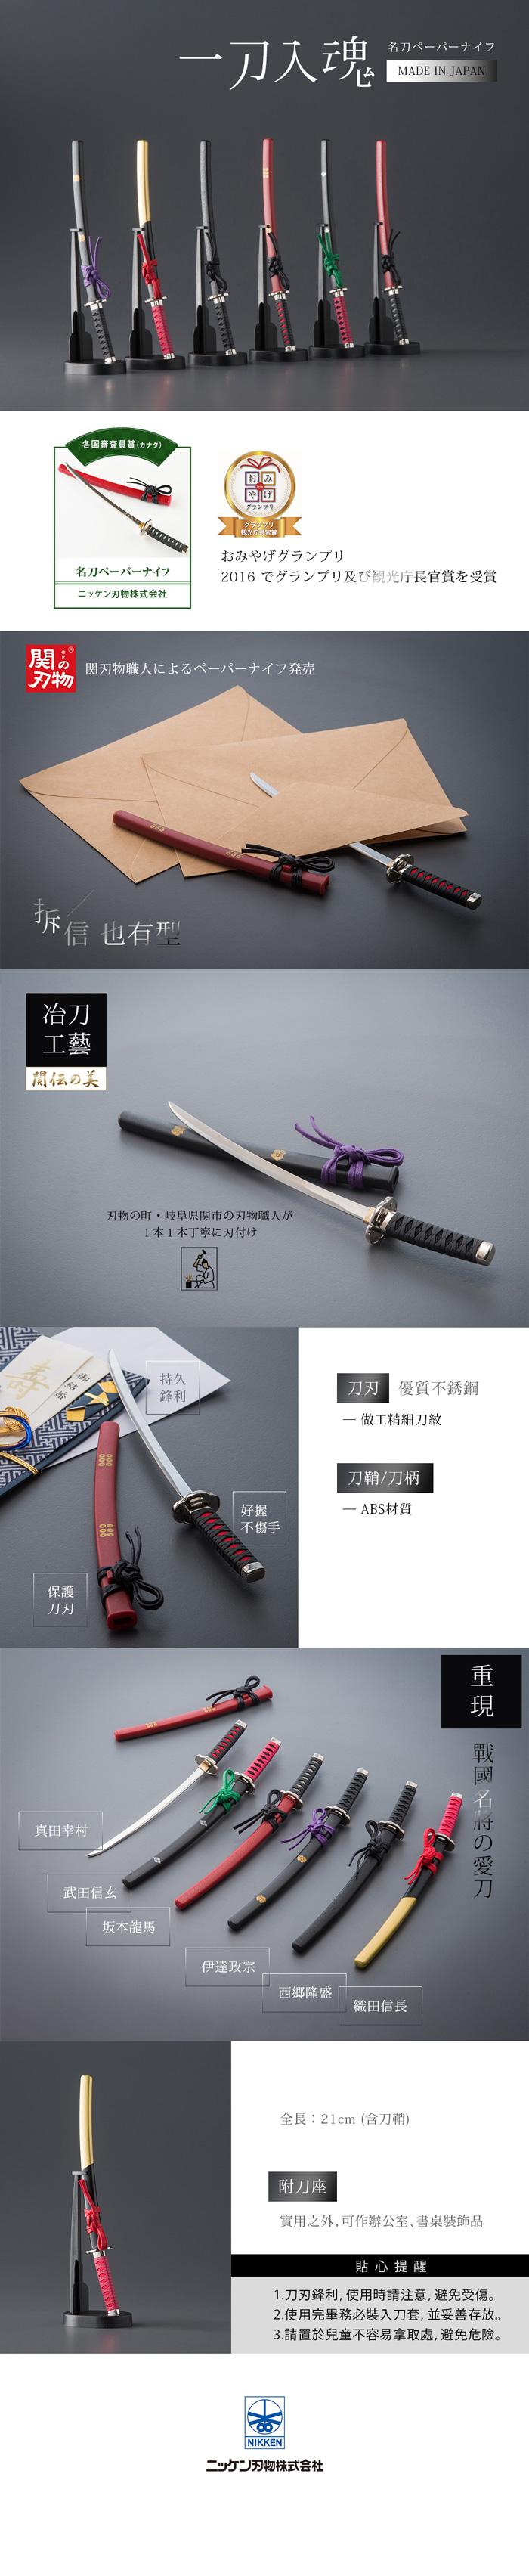 nikken-cutlery 復刻名將 武士魂拆信刀 (坂本龍馬)